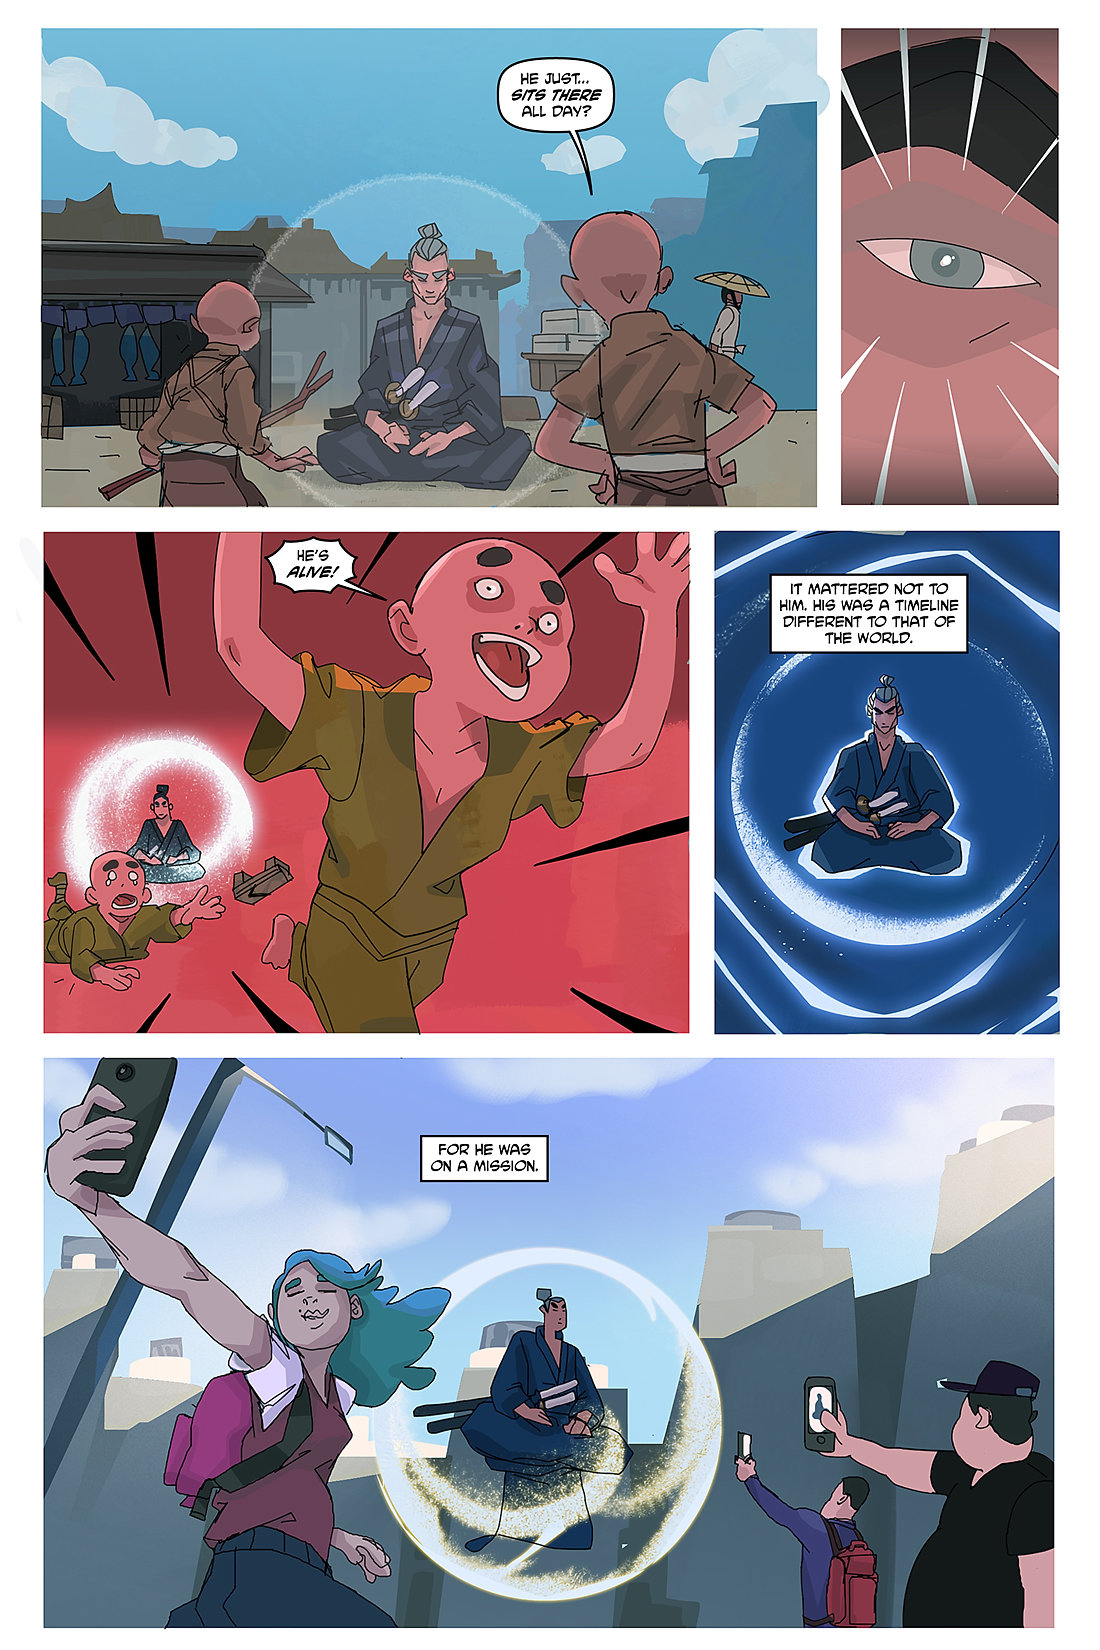 Starwind_Page02.jpg